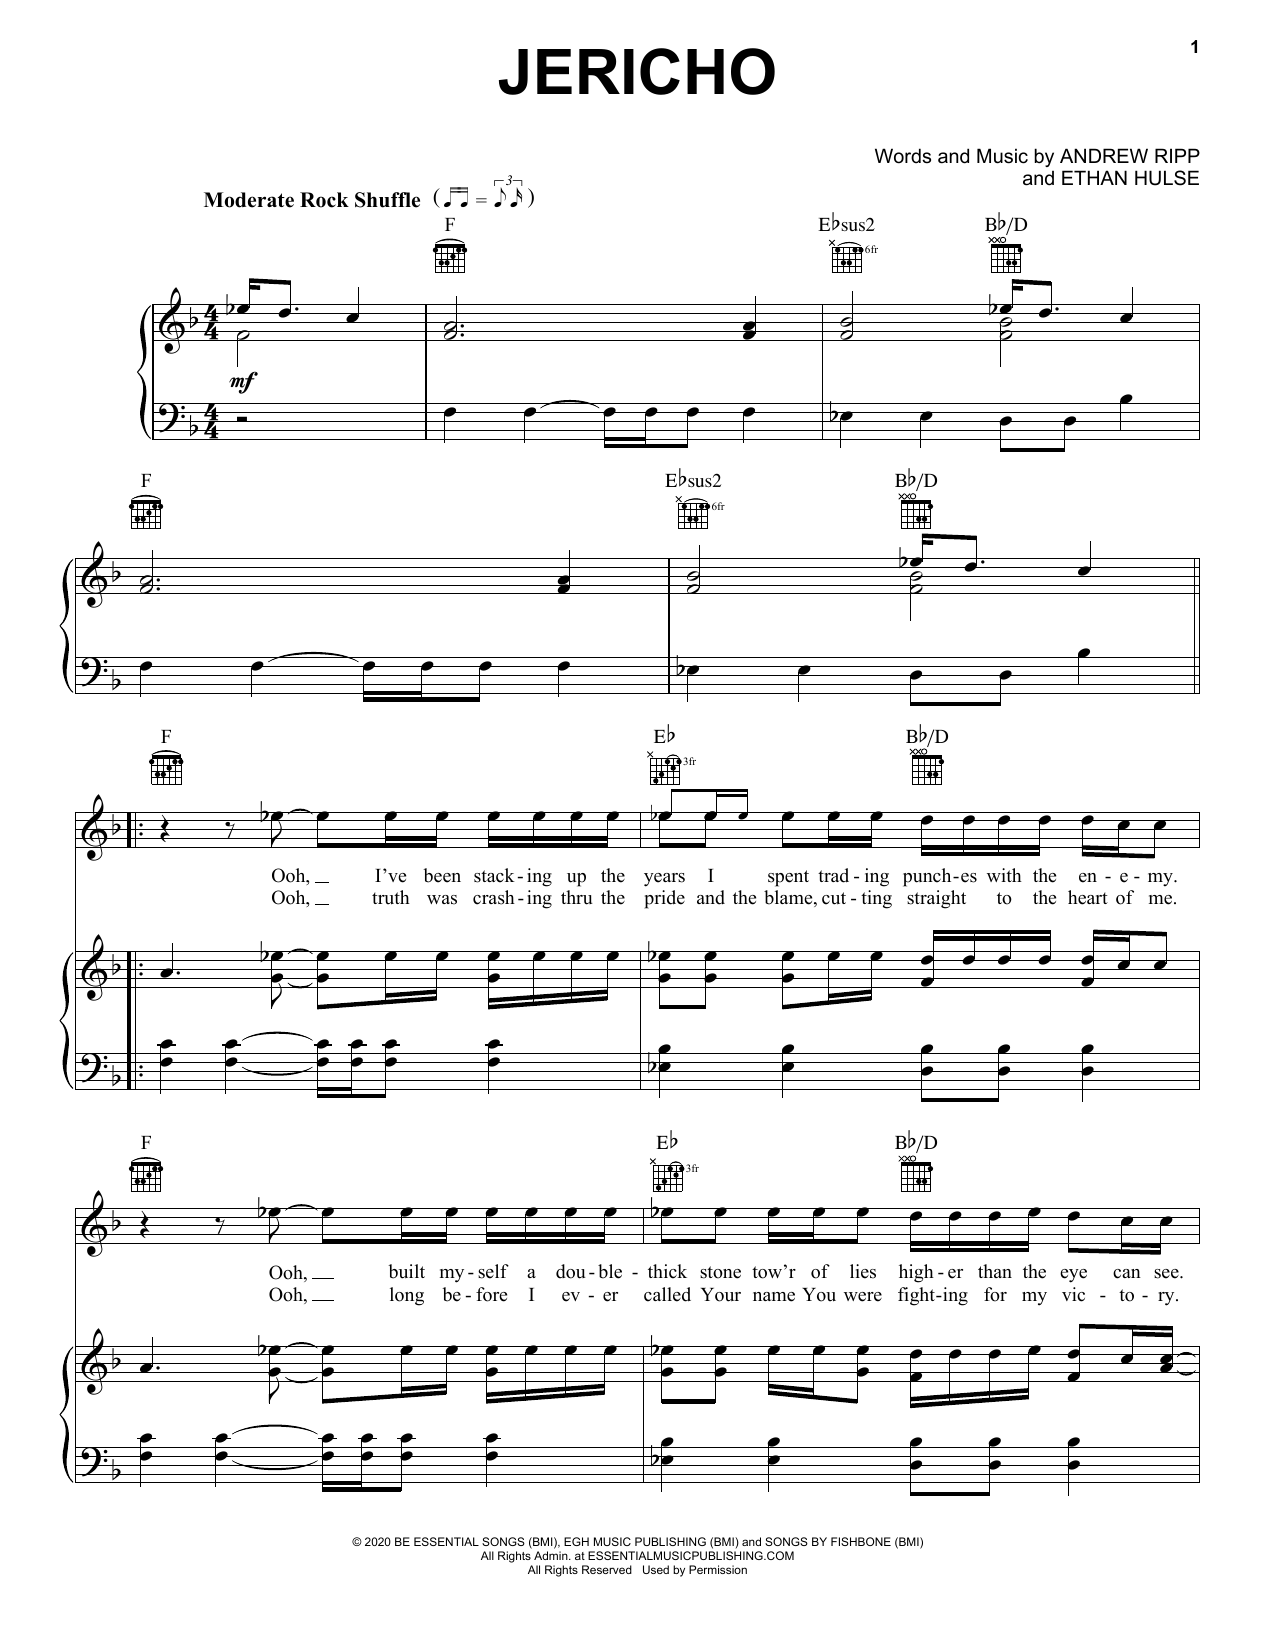 Andrew Ripp Jericho sheet music notes printable PDF score